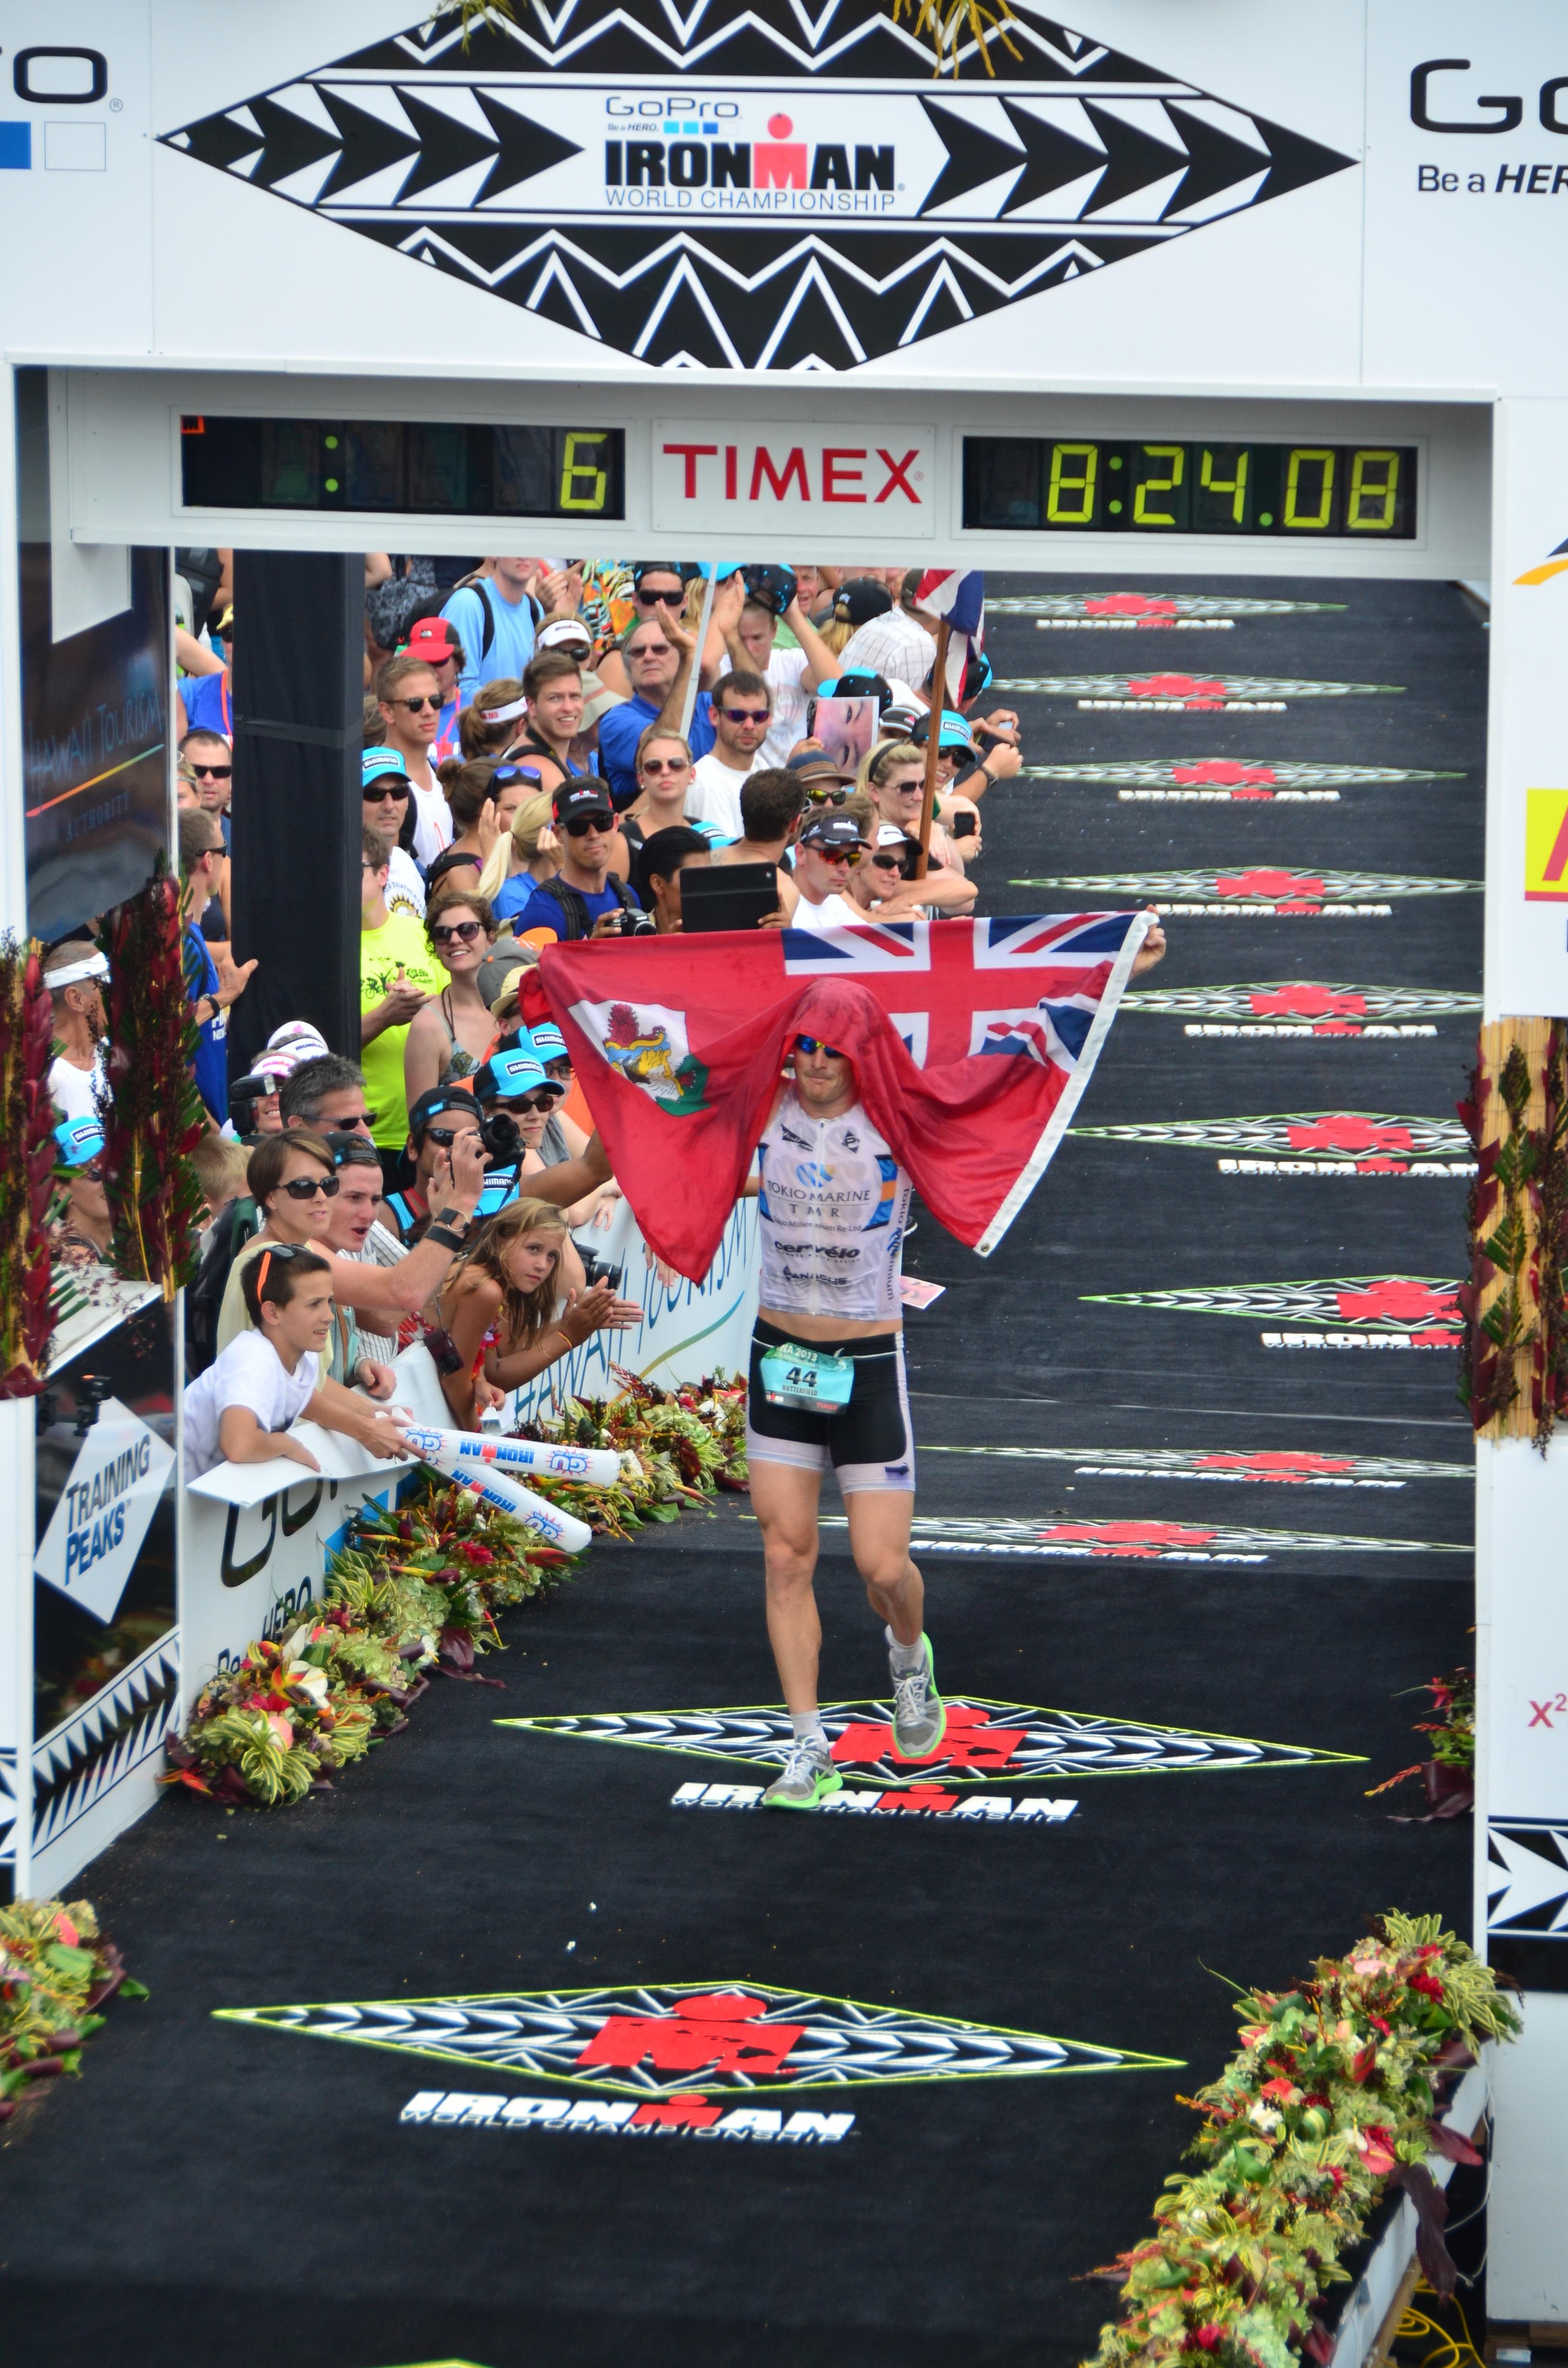 Butterfield Announces Full Focus On Long-Course Triathlon